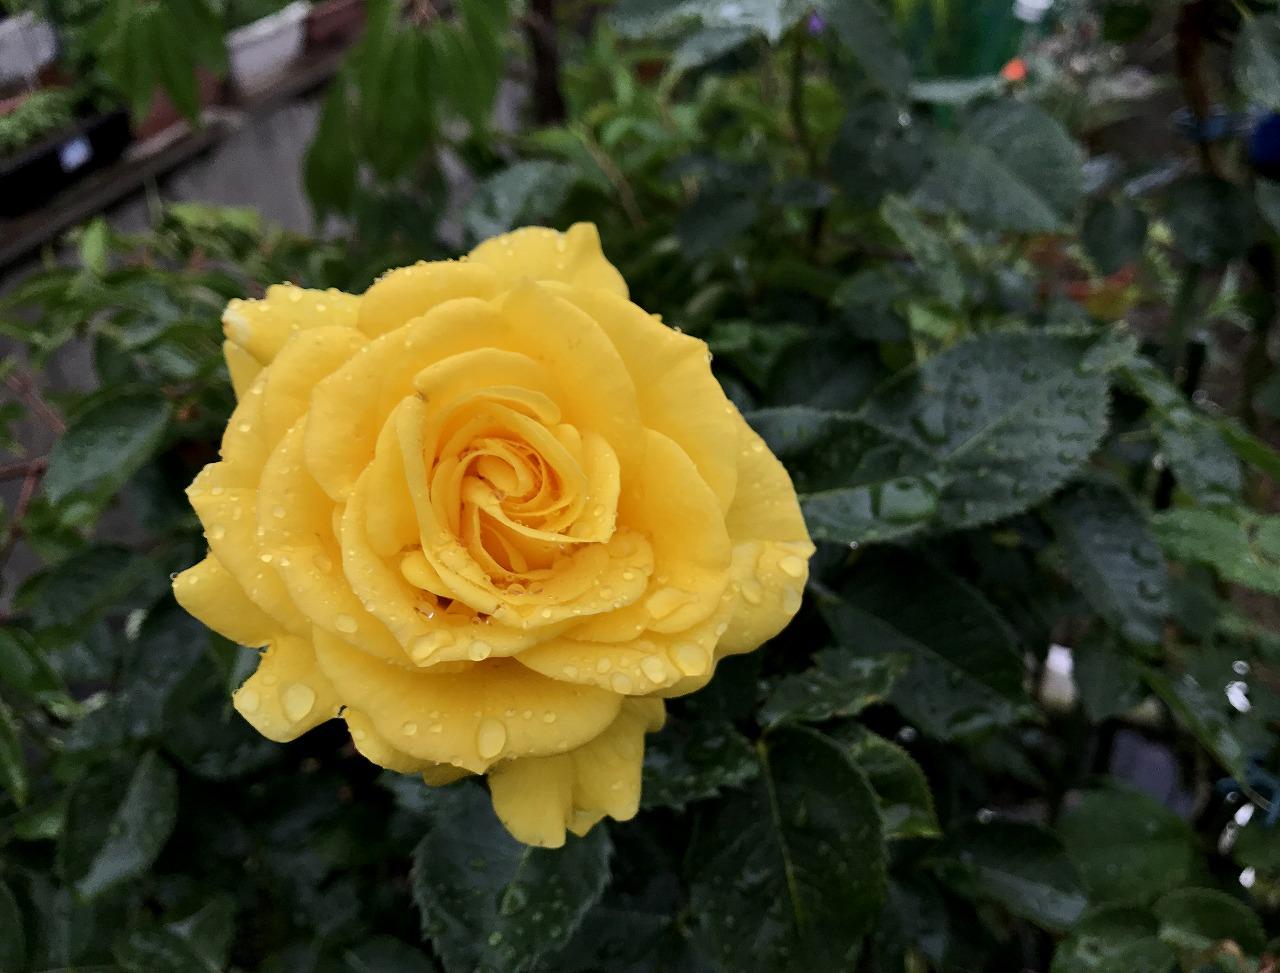 20170607-Rose_SunSprite-I01.jpg